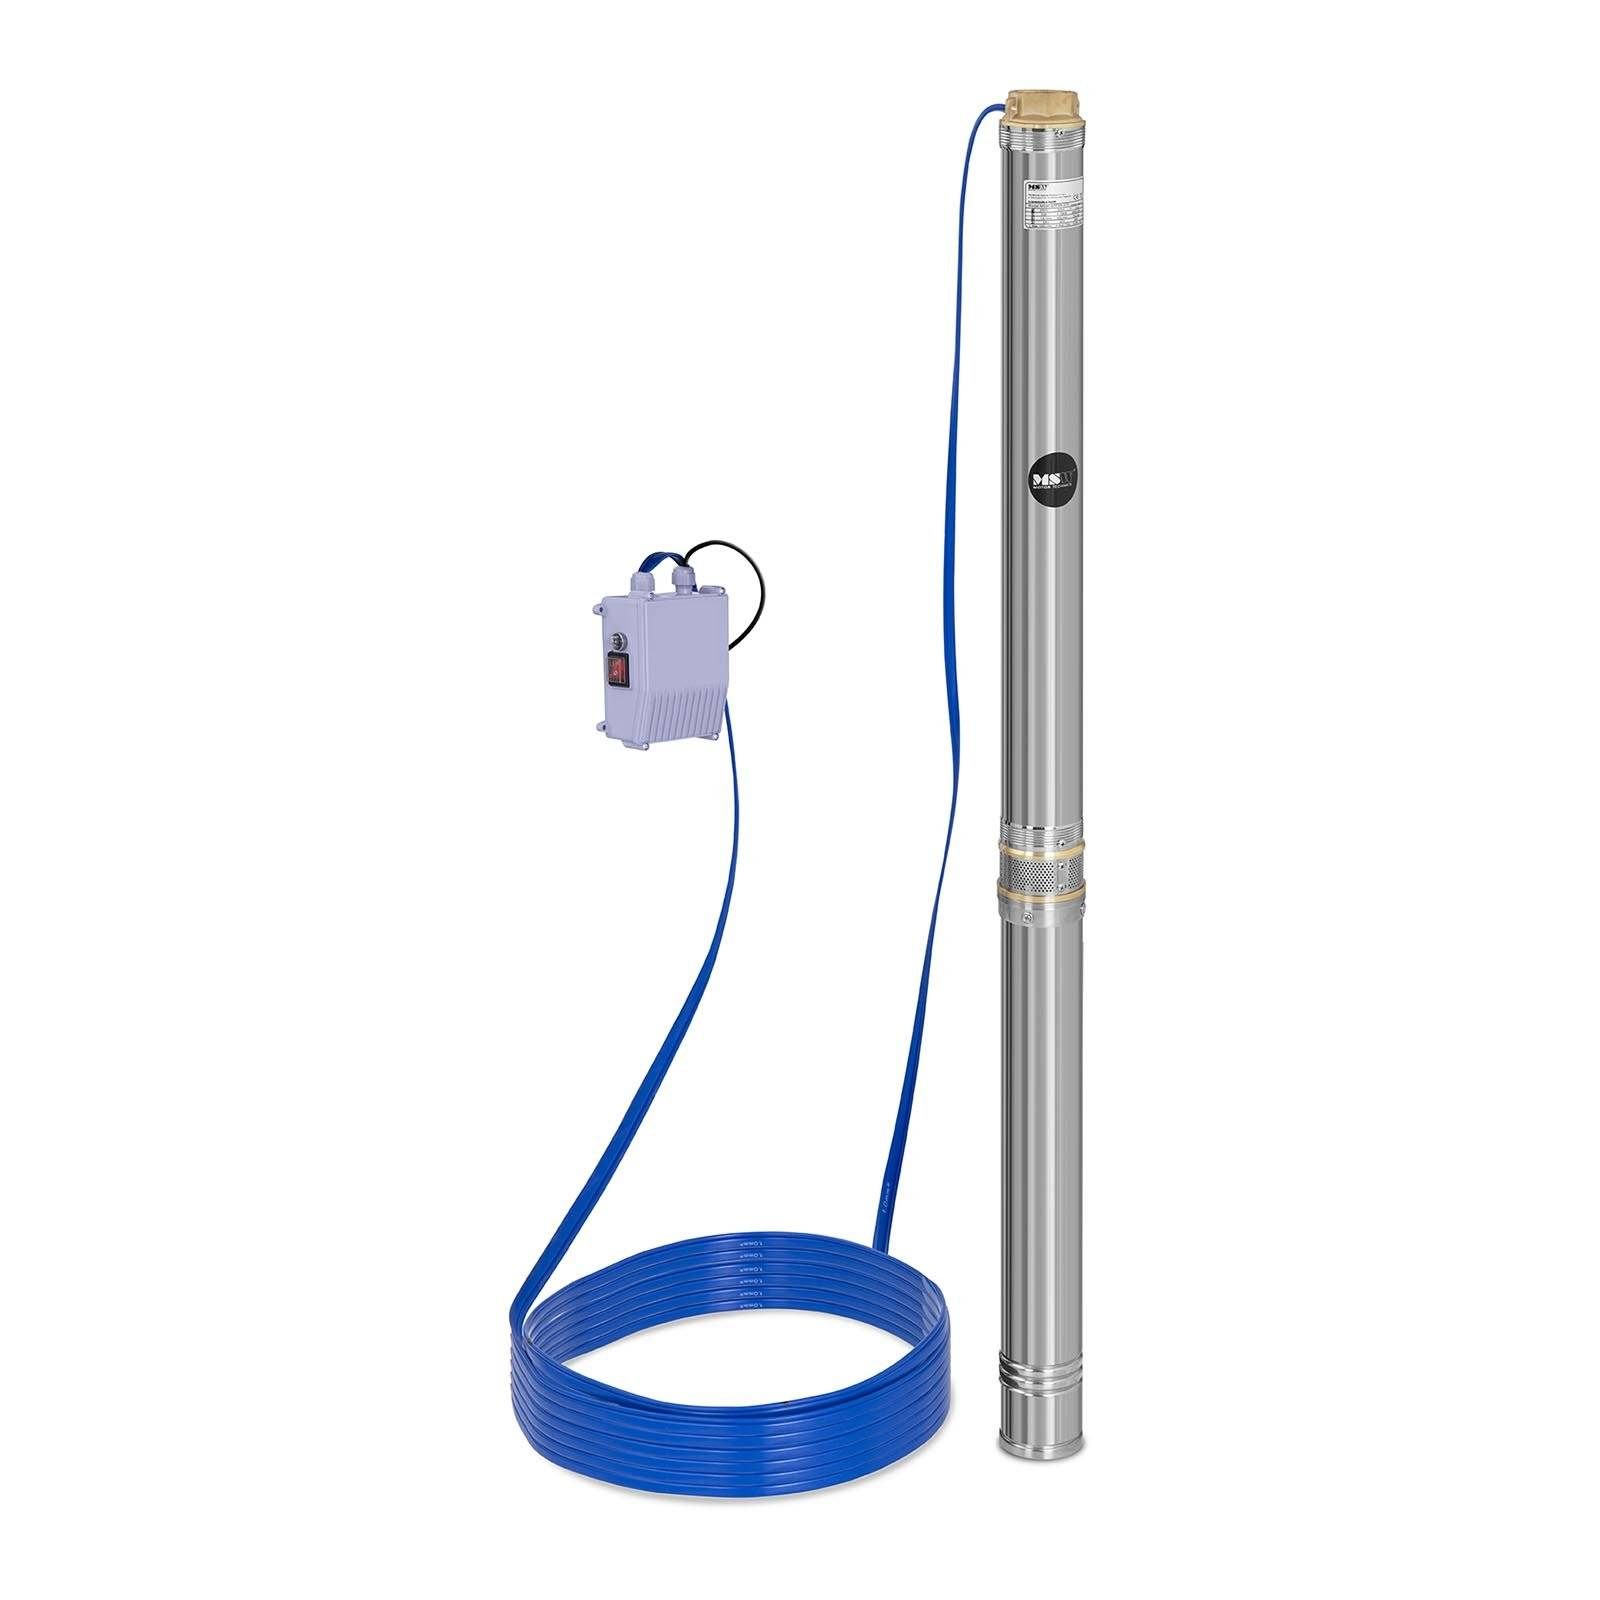 MSW Pompe immergée - 10 800 L/h - 2 200 W - acier inoxydable MSW-SPP48-220